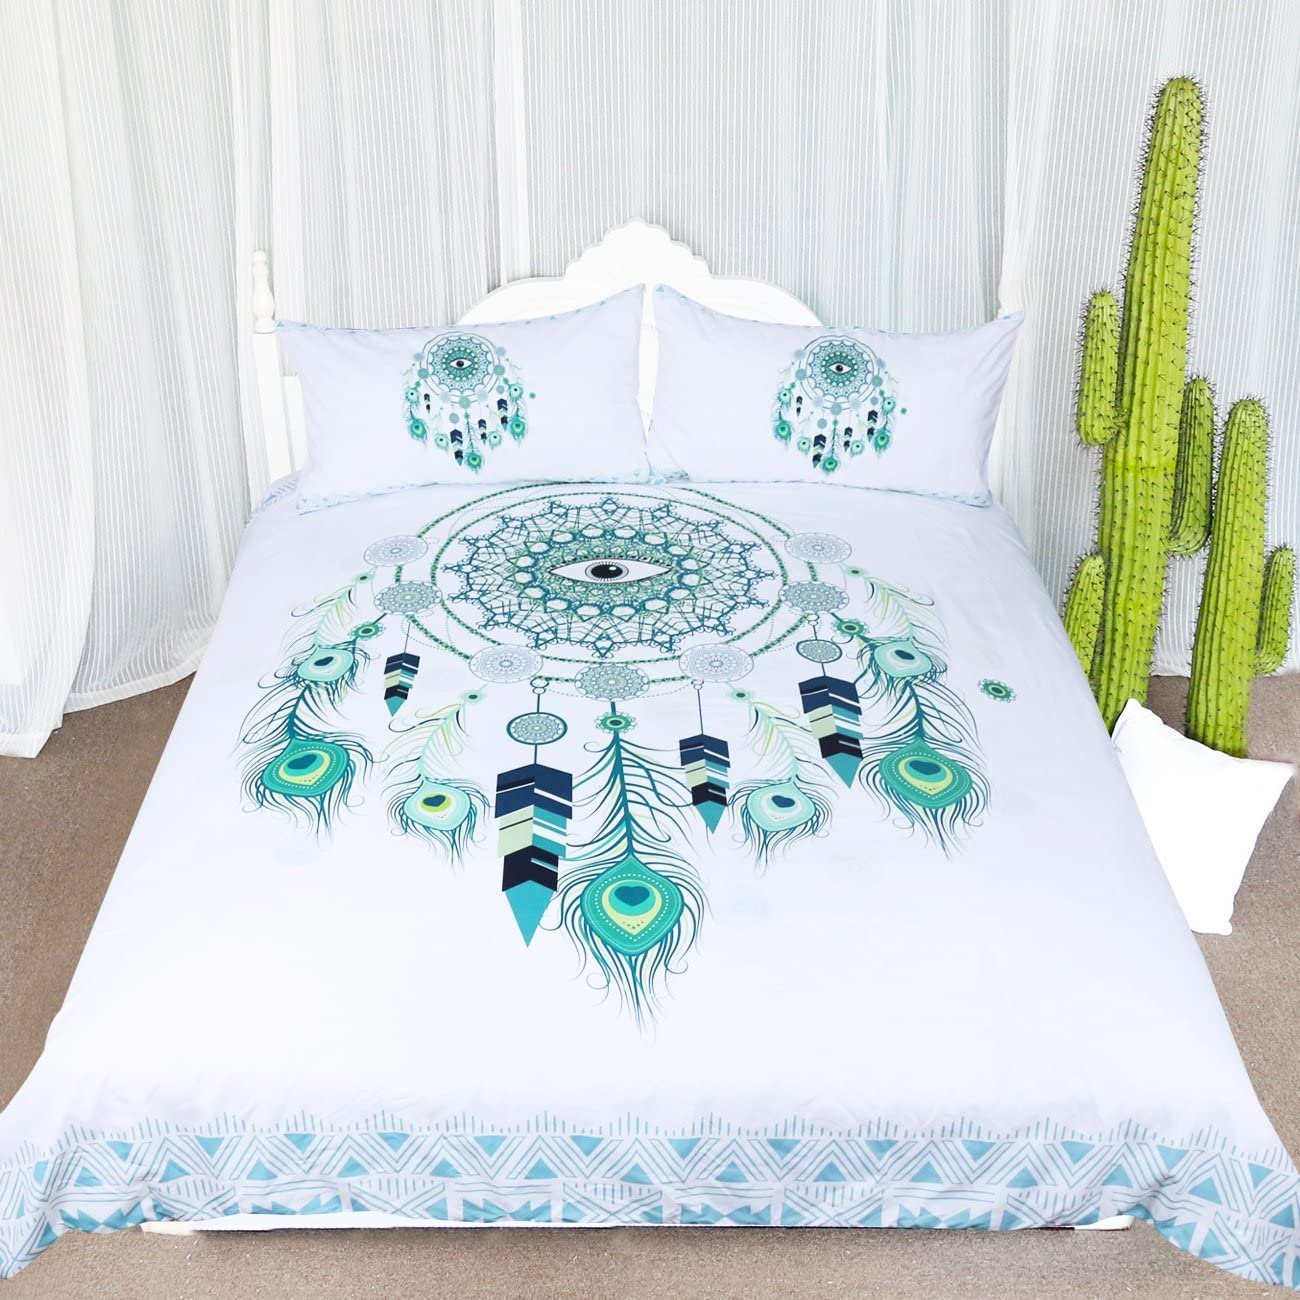 ARIGHTEX Blue Green Dreamcatcher Bedding Pieces Year-end Max 74% OFF annual account 3 Bohemian Dream